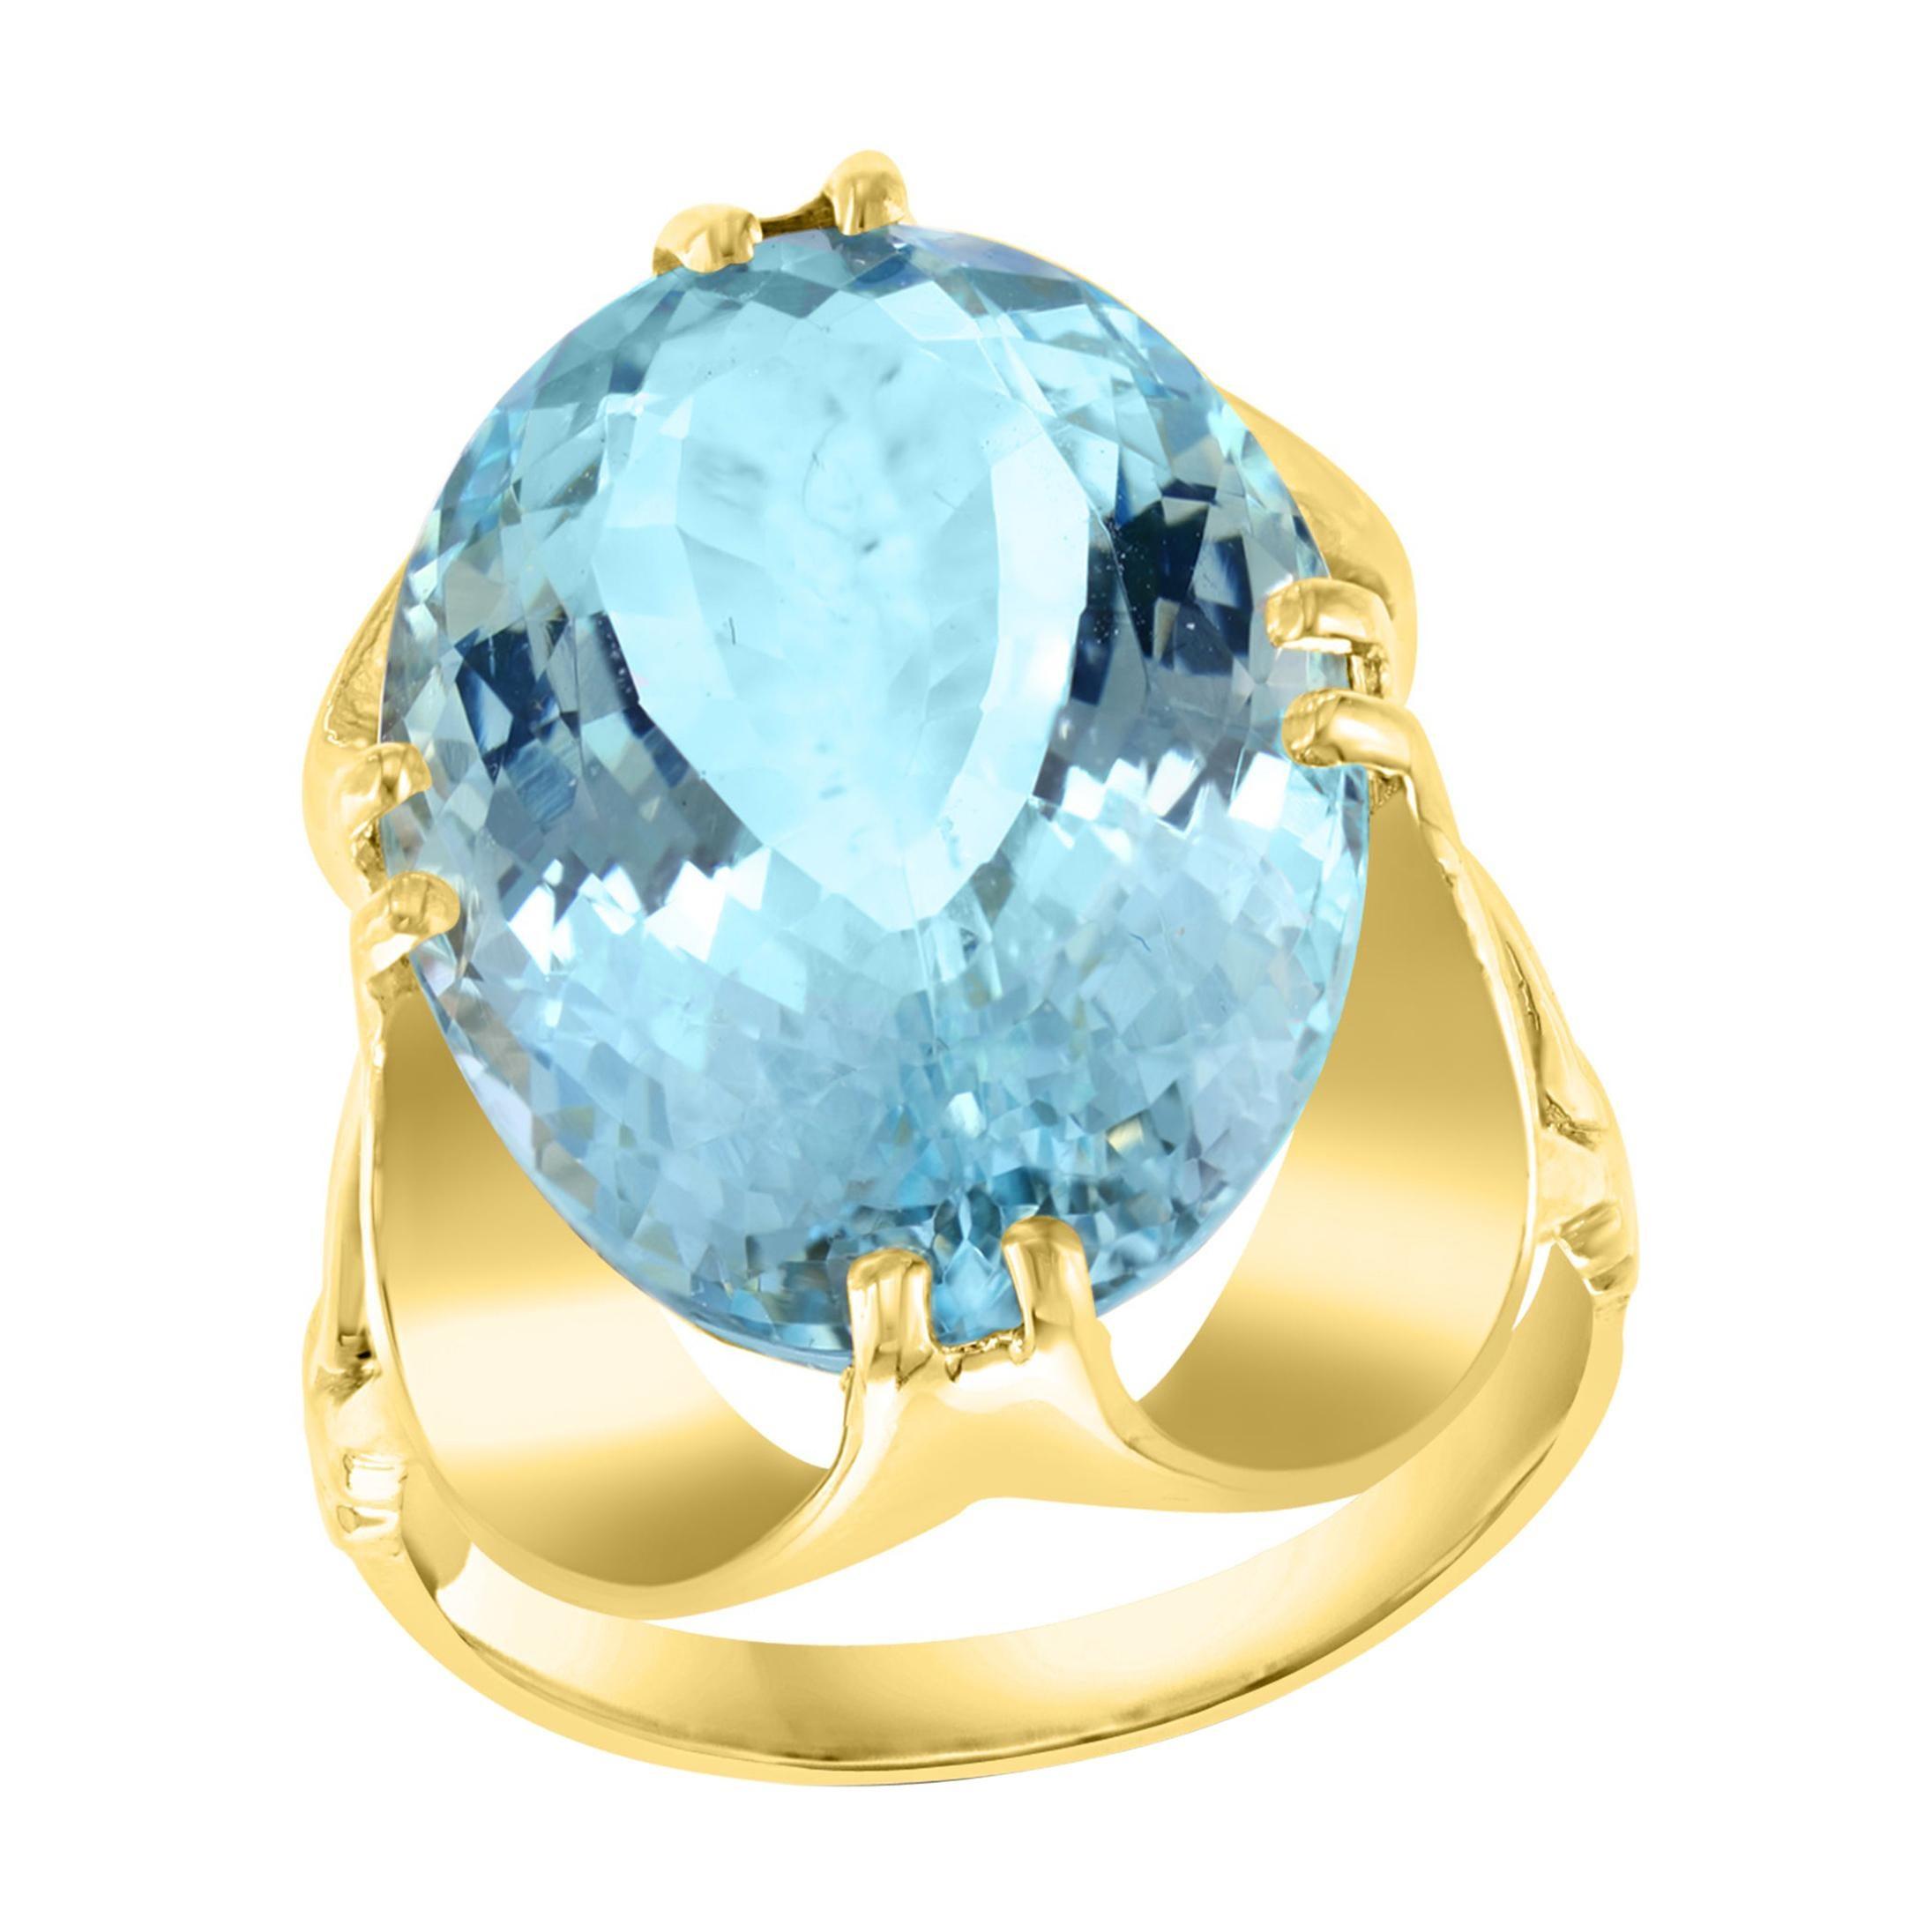 12.54 Carat Natural Oval Shape Aquamarine Cocktail Ring 14 Karat Yellow Gold